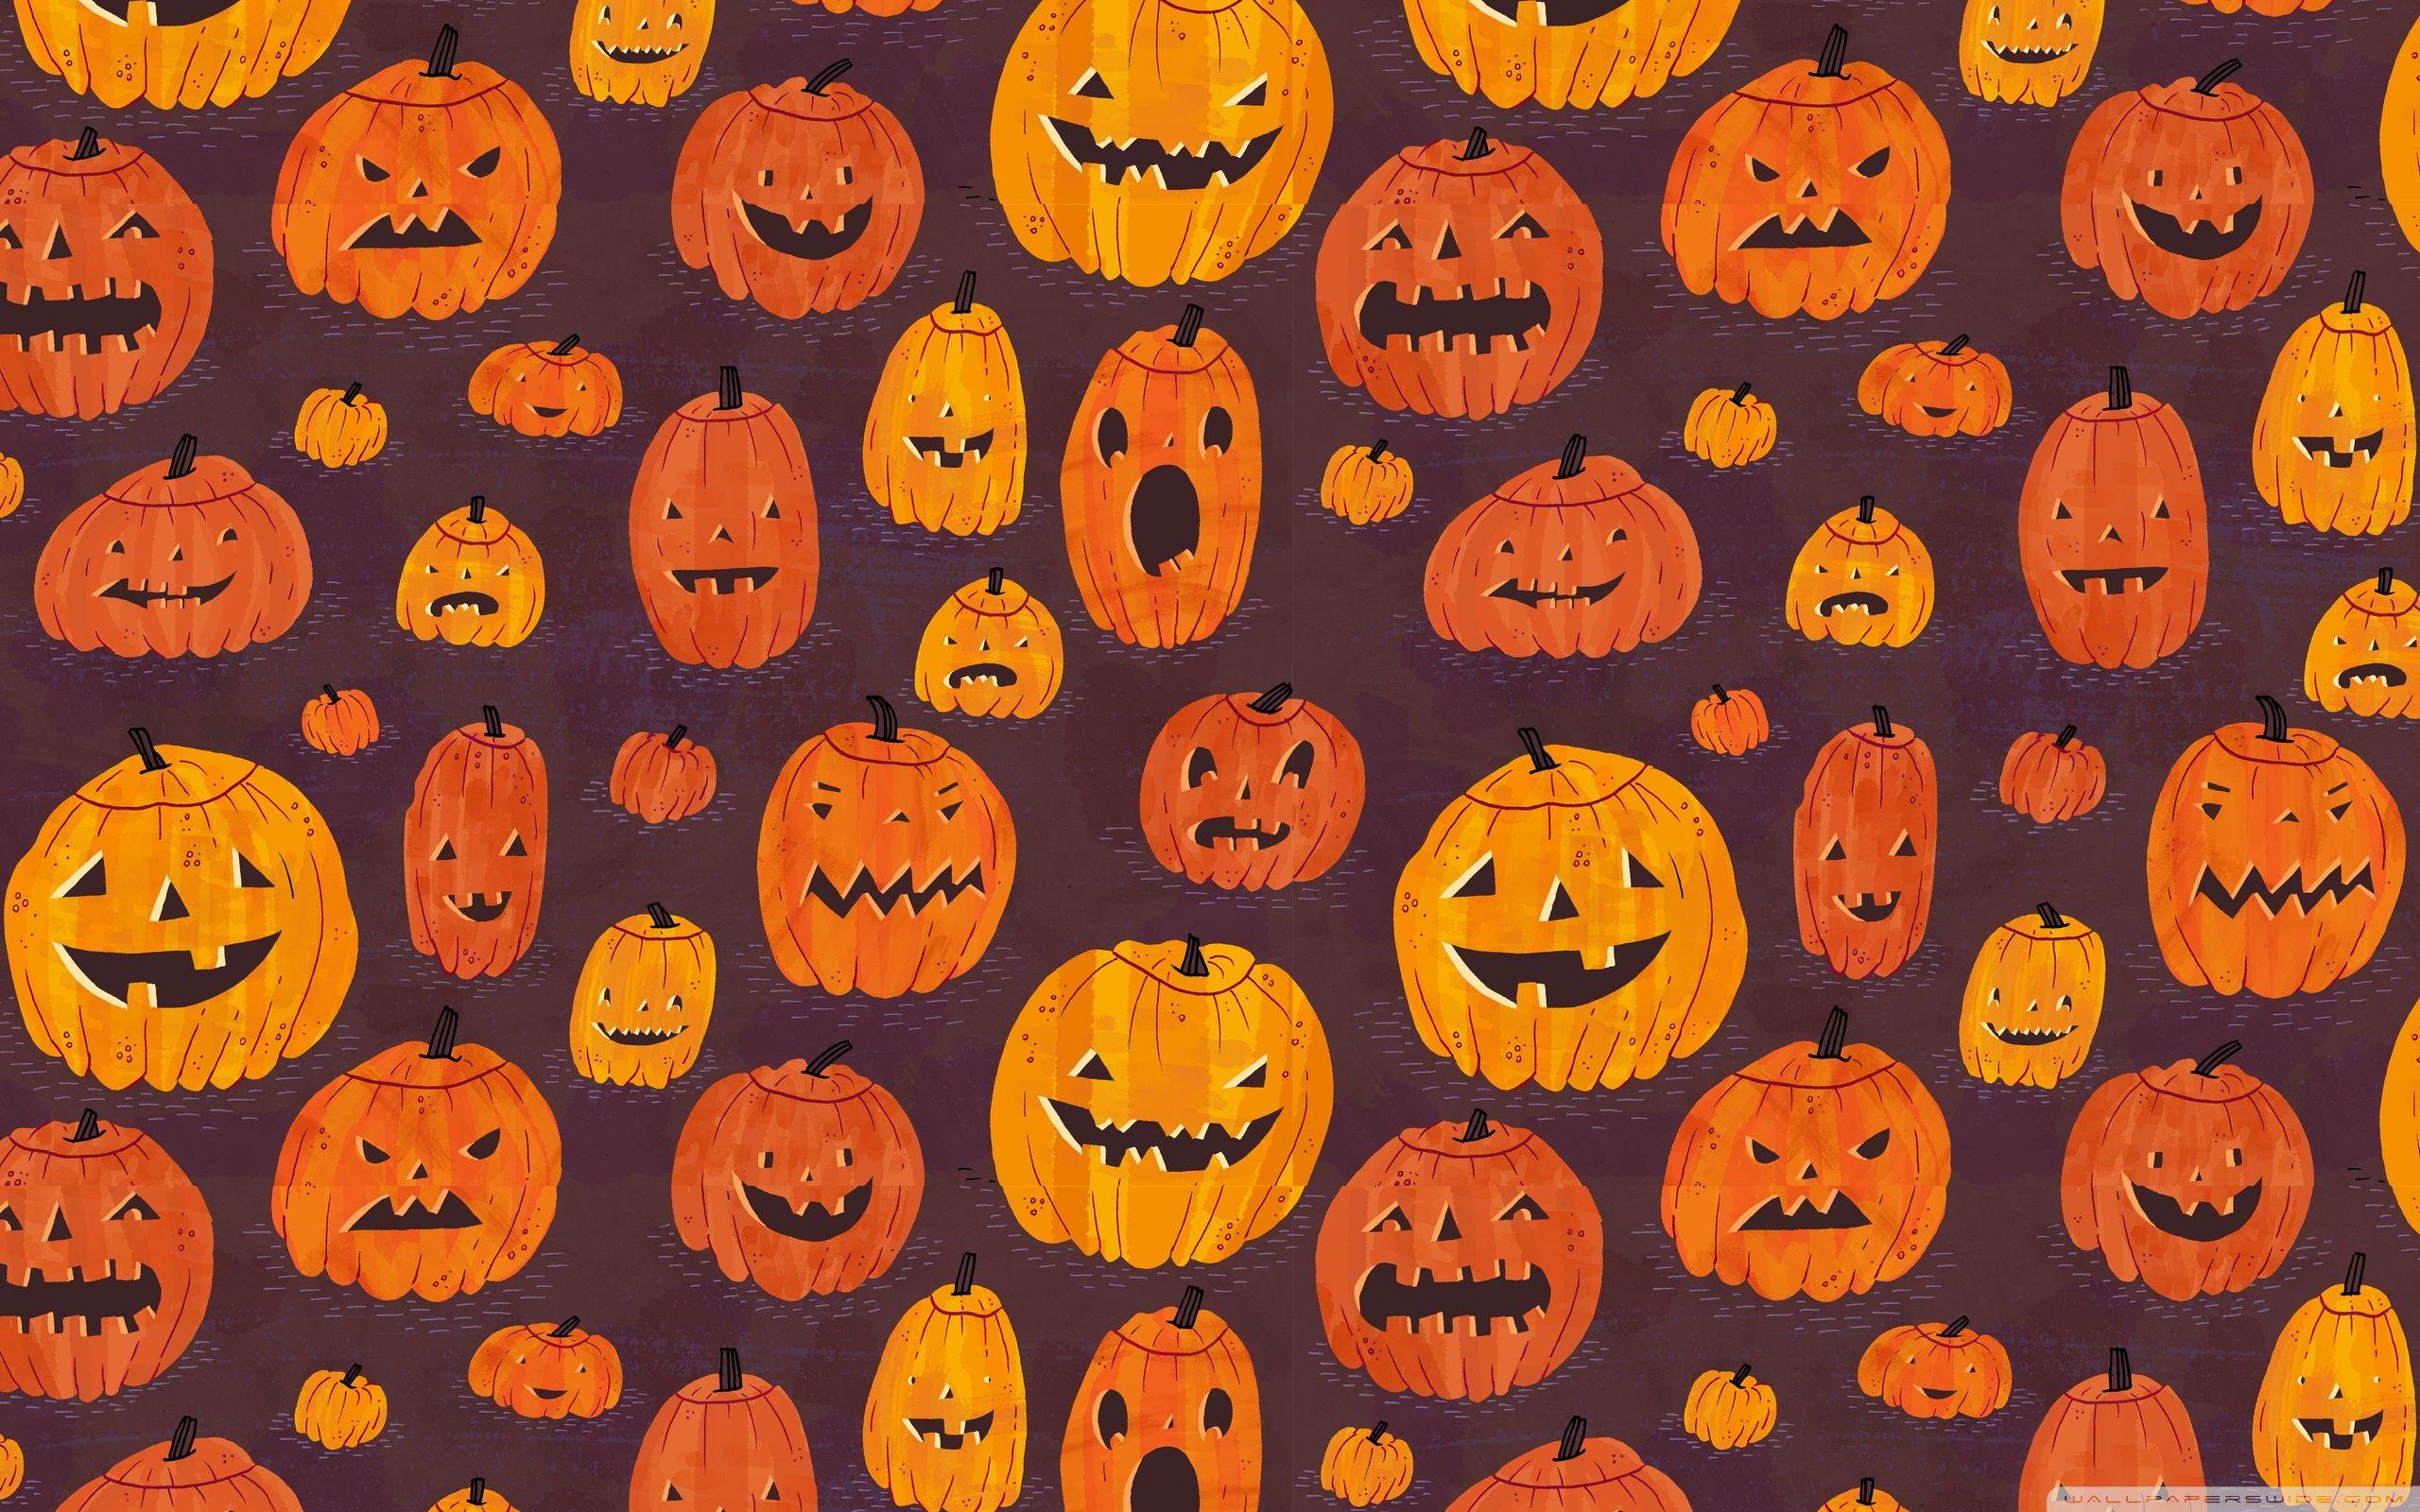 60 Cute Halloween Pattern Wallpapers   Download at WallpaperBro 2560x1600